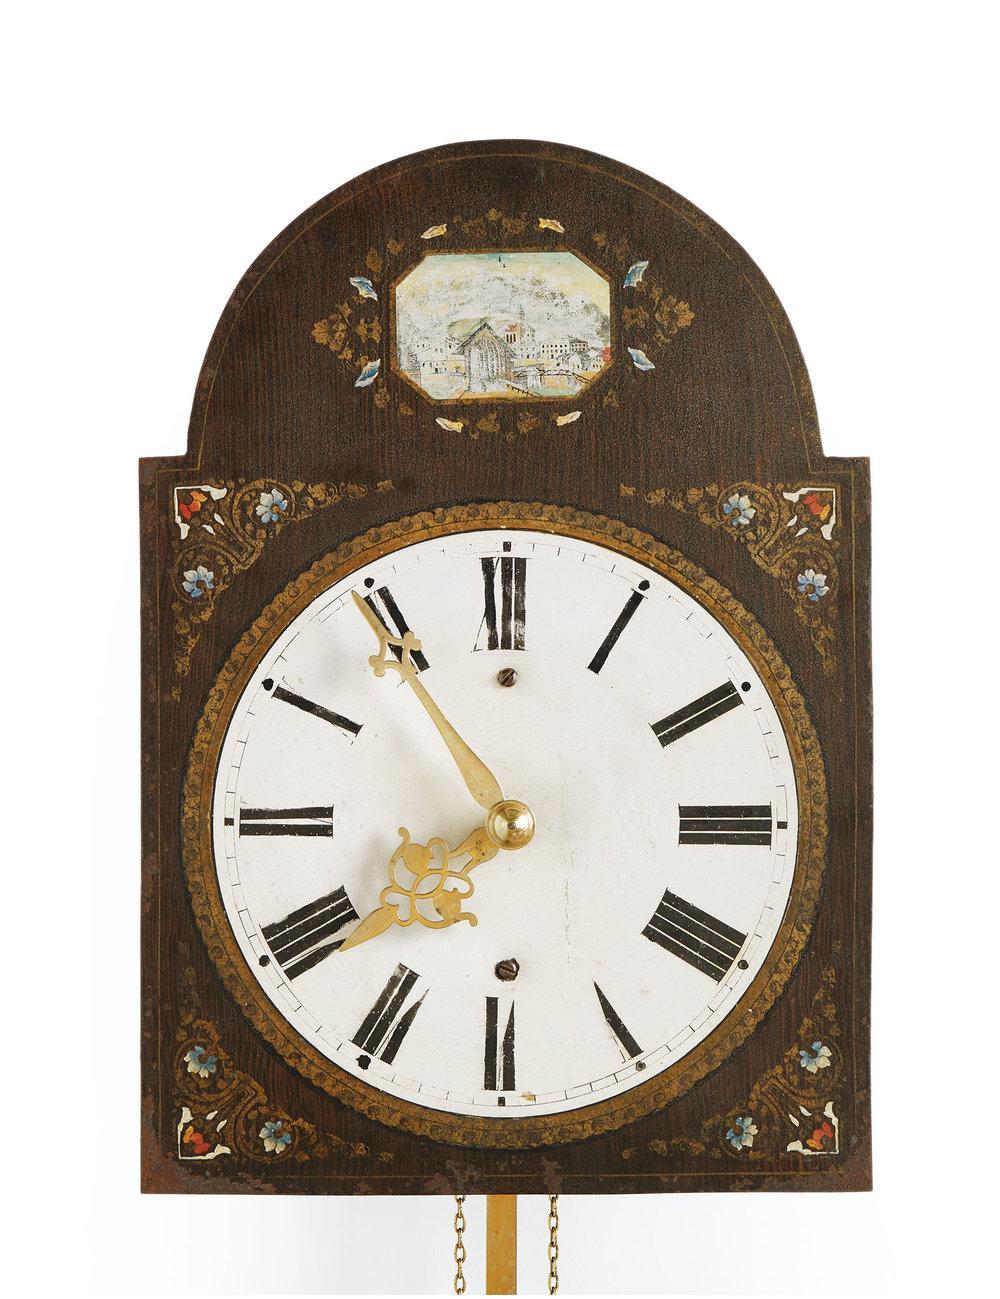 Mandtler Clock no. 8267, 1865. Mennonite Heritage Village 1966.406.1 (MC0217)